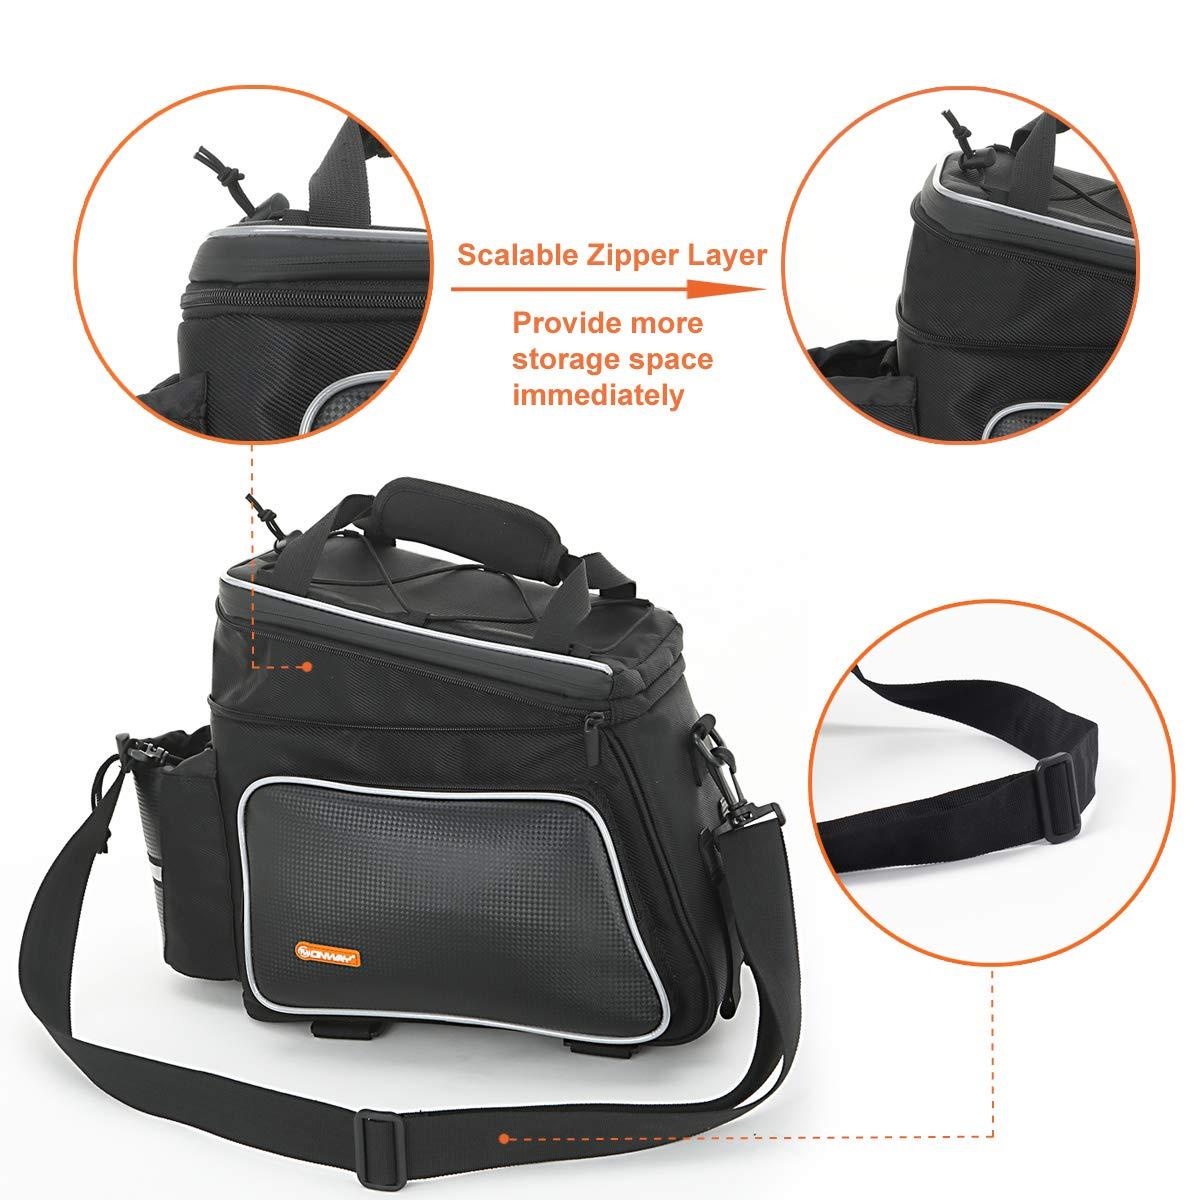 e4c3bca3e2a6 Amazon.com   ONWAY Bike Rack Bag Waterproof Bike Bags Rear Rack Mount with  Reflective Trim